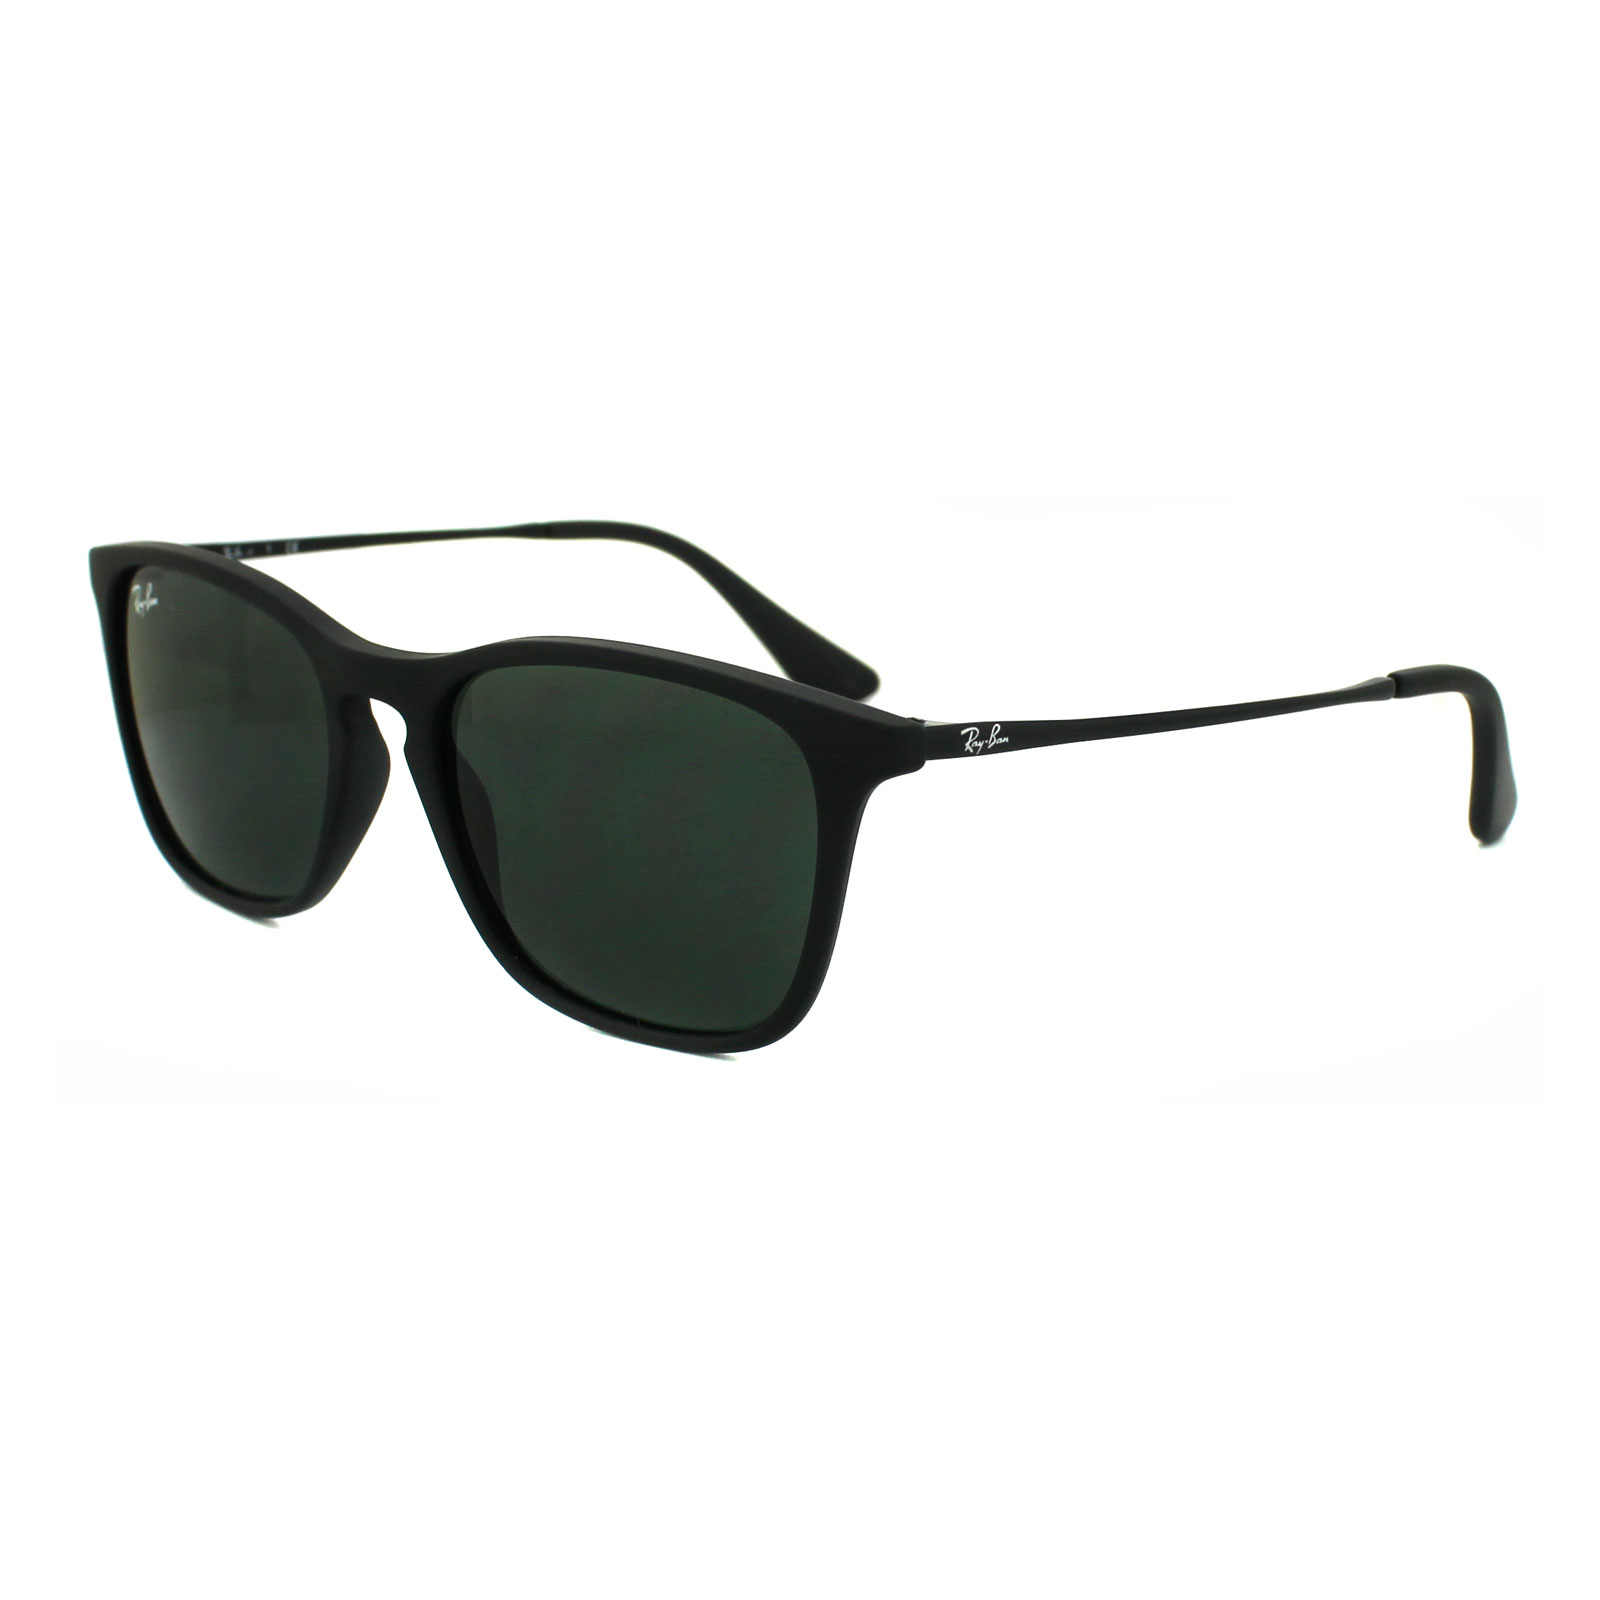 ray ban sunglasses quicker  ray ban junior sunglasses chris junior 9061 700571 rubber black green